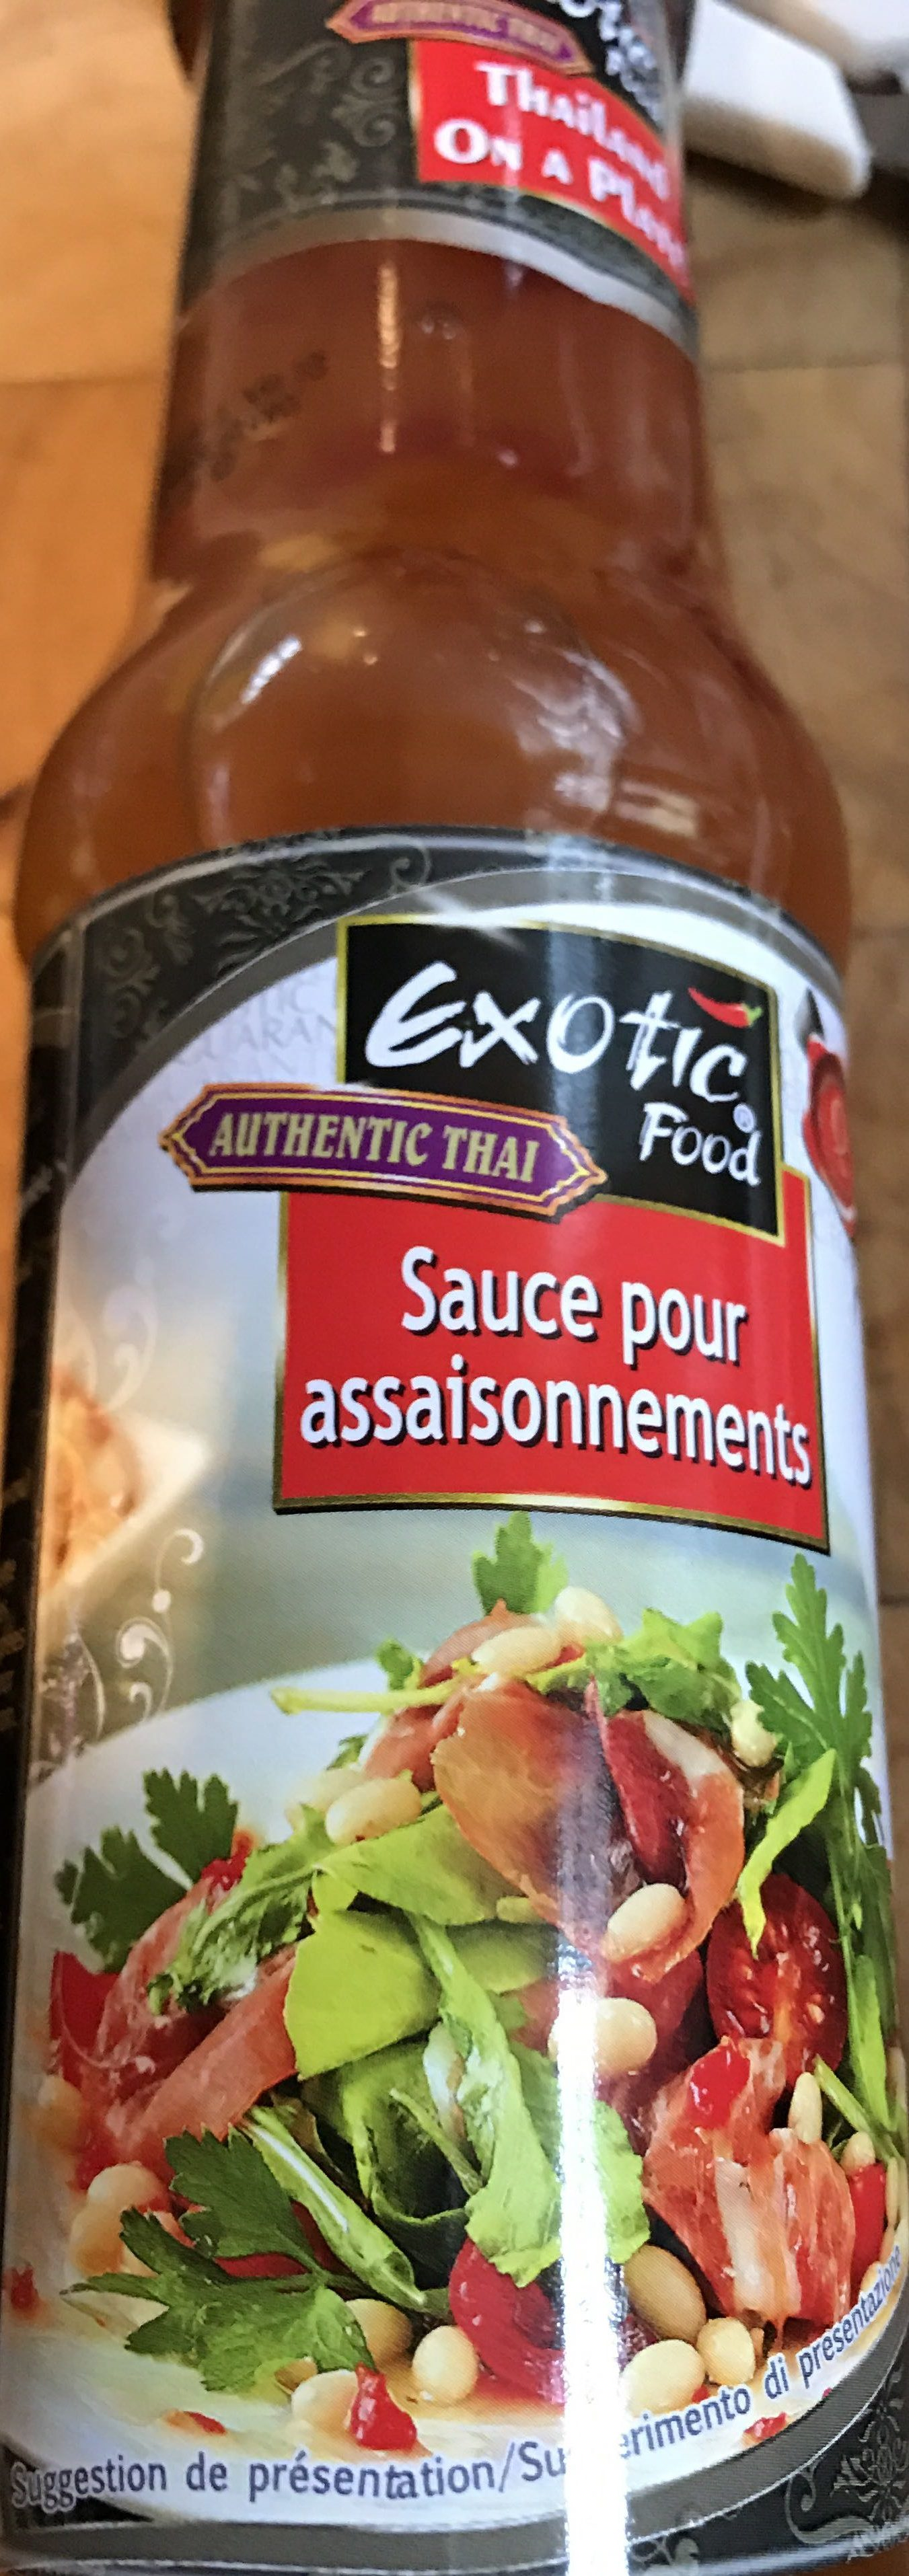 Sauce Pimentee Pour Salade - Product - fr